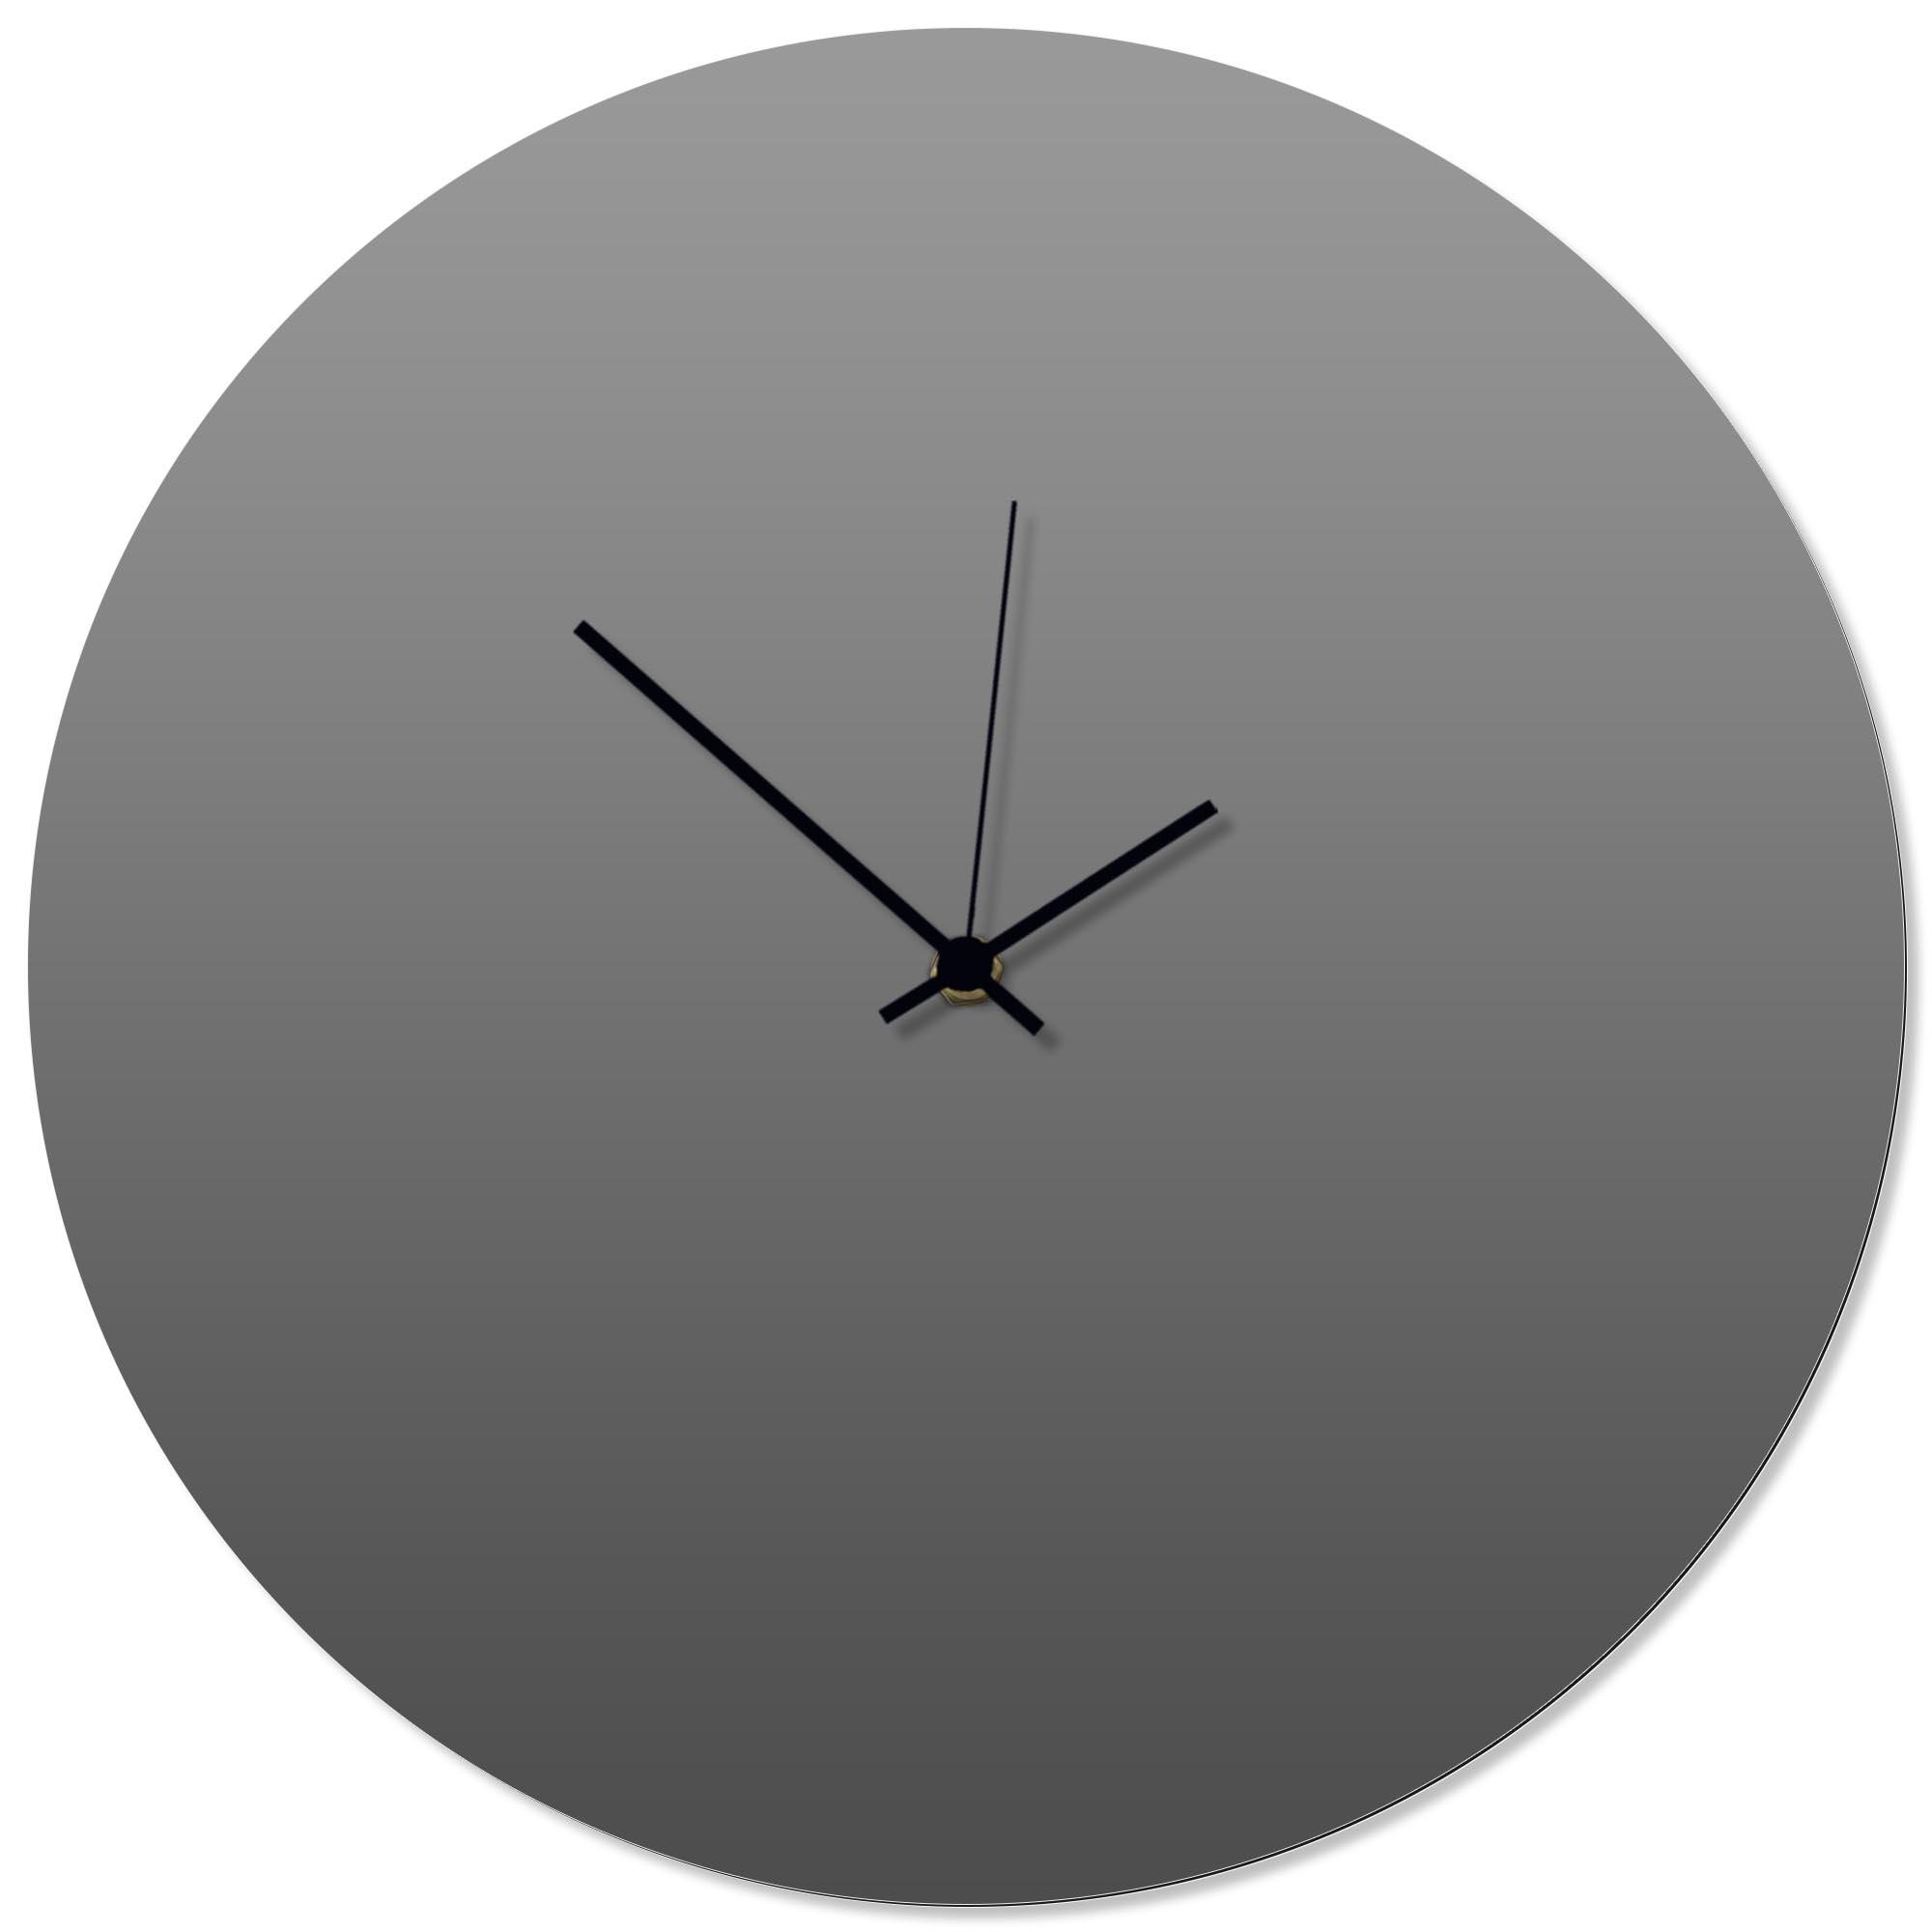 Grayout Black Circle Clock 16x16in. Aluminum Polymetal